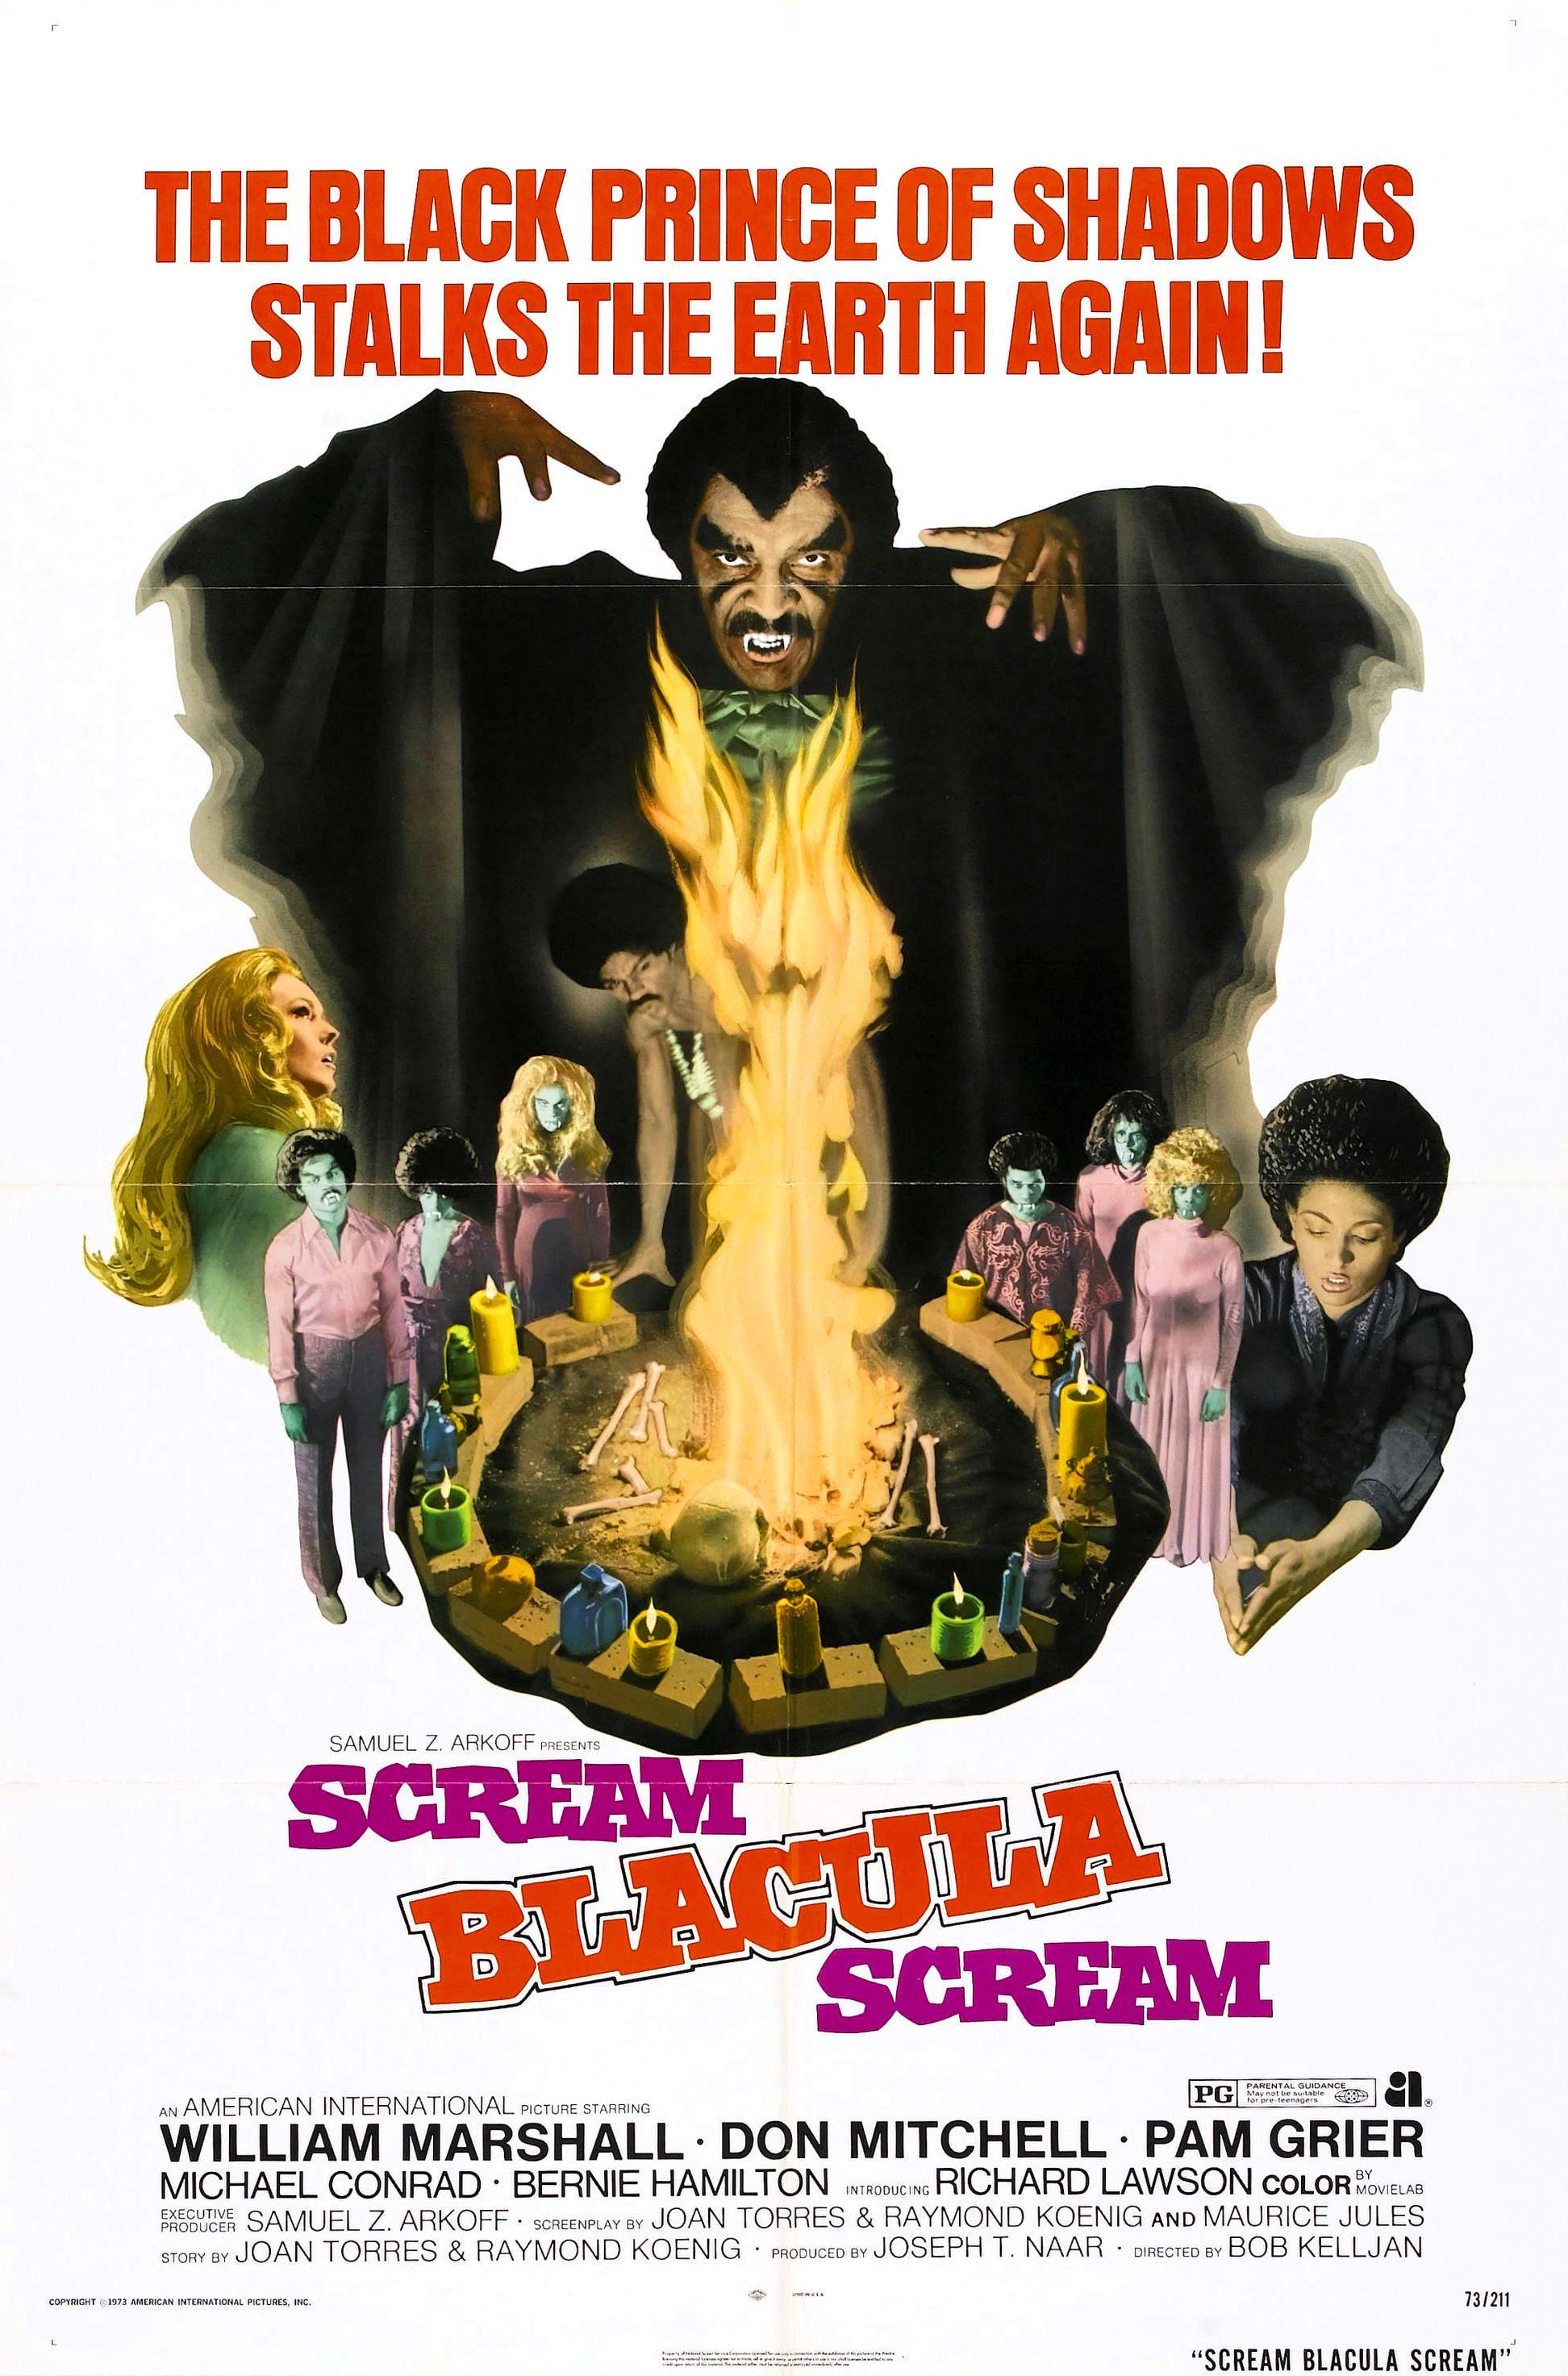 Scream, Blacula, Scream (1973)